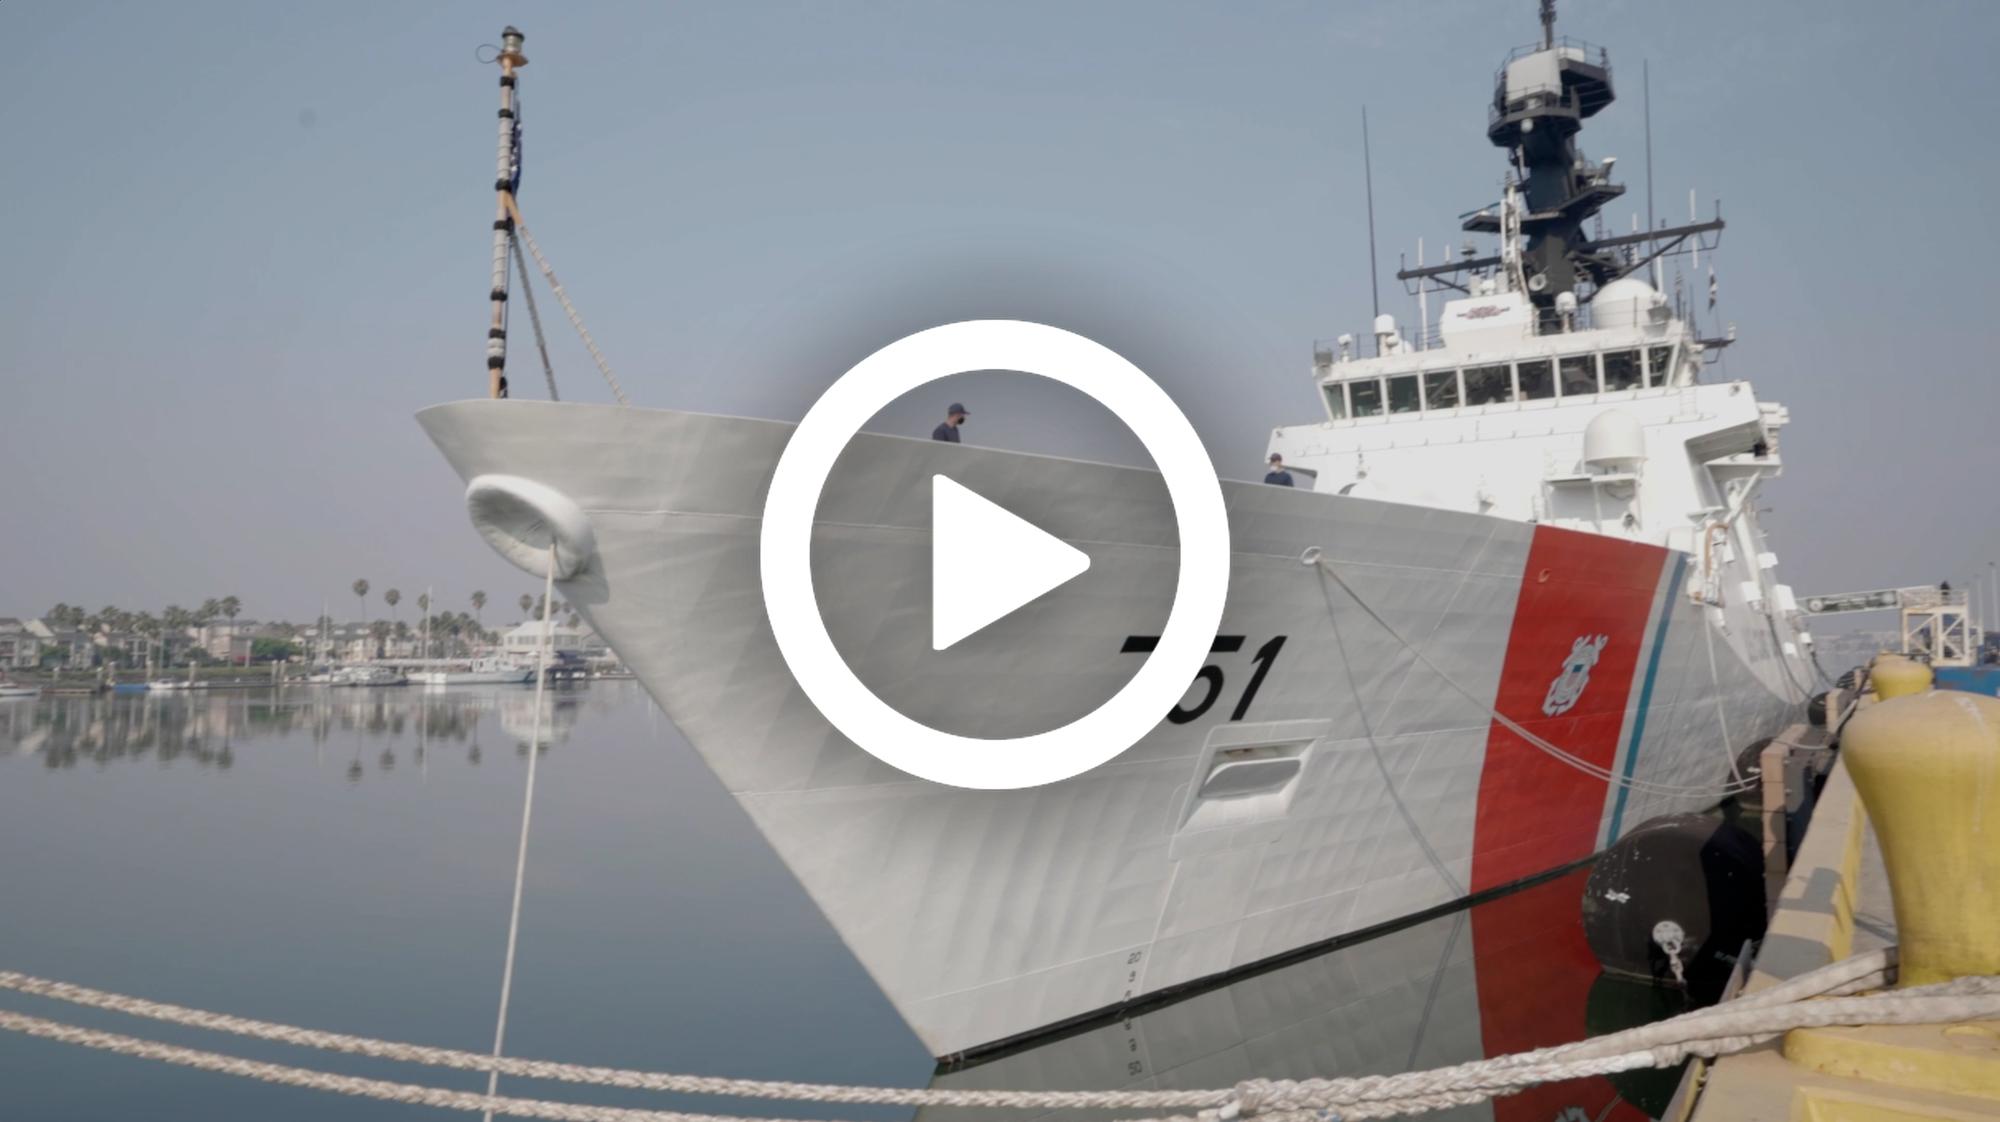 VIDEO: Alameda, California-based Coast Guard cutter departs for Western Pacific patrol